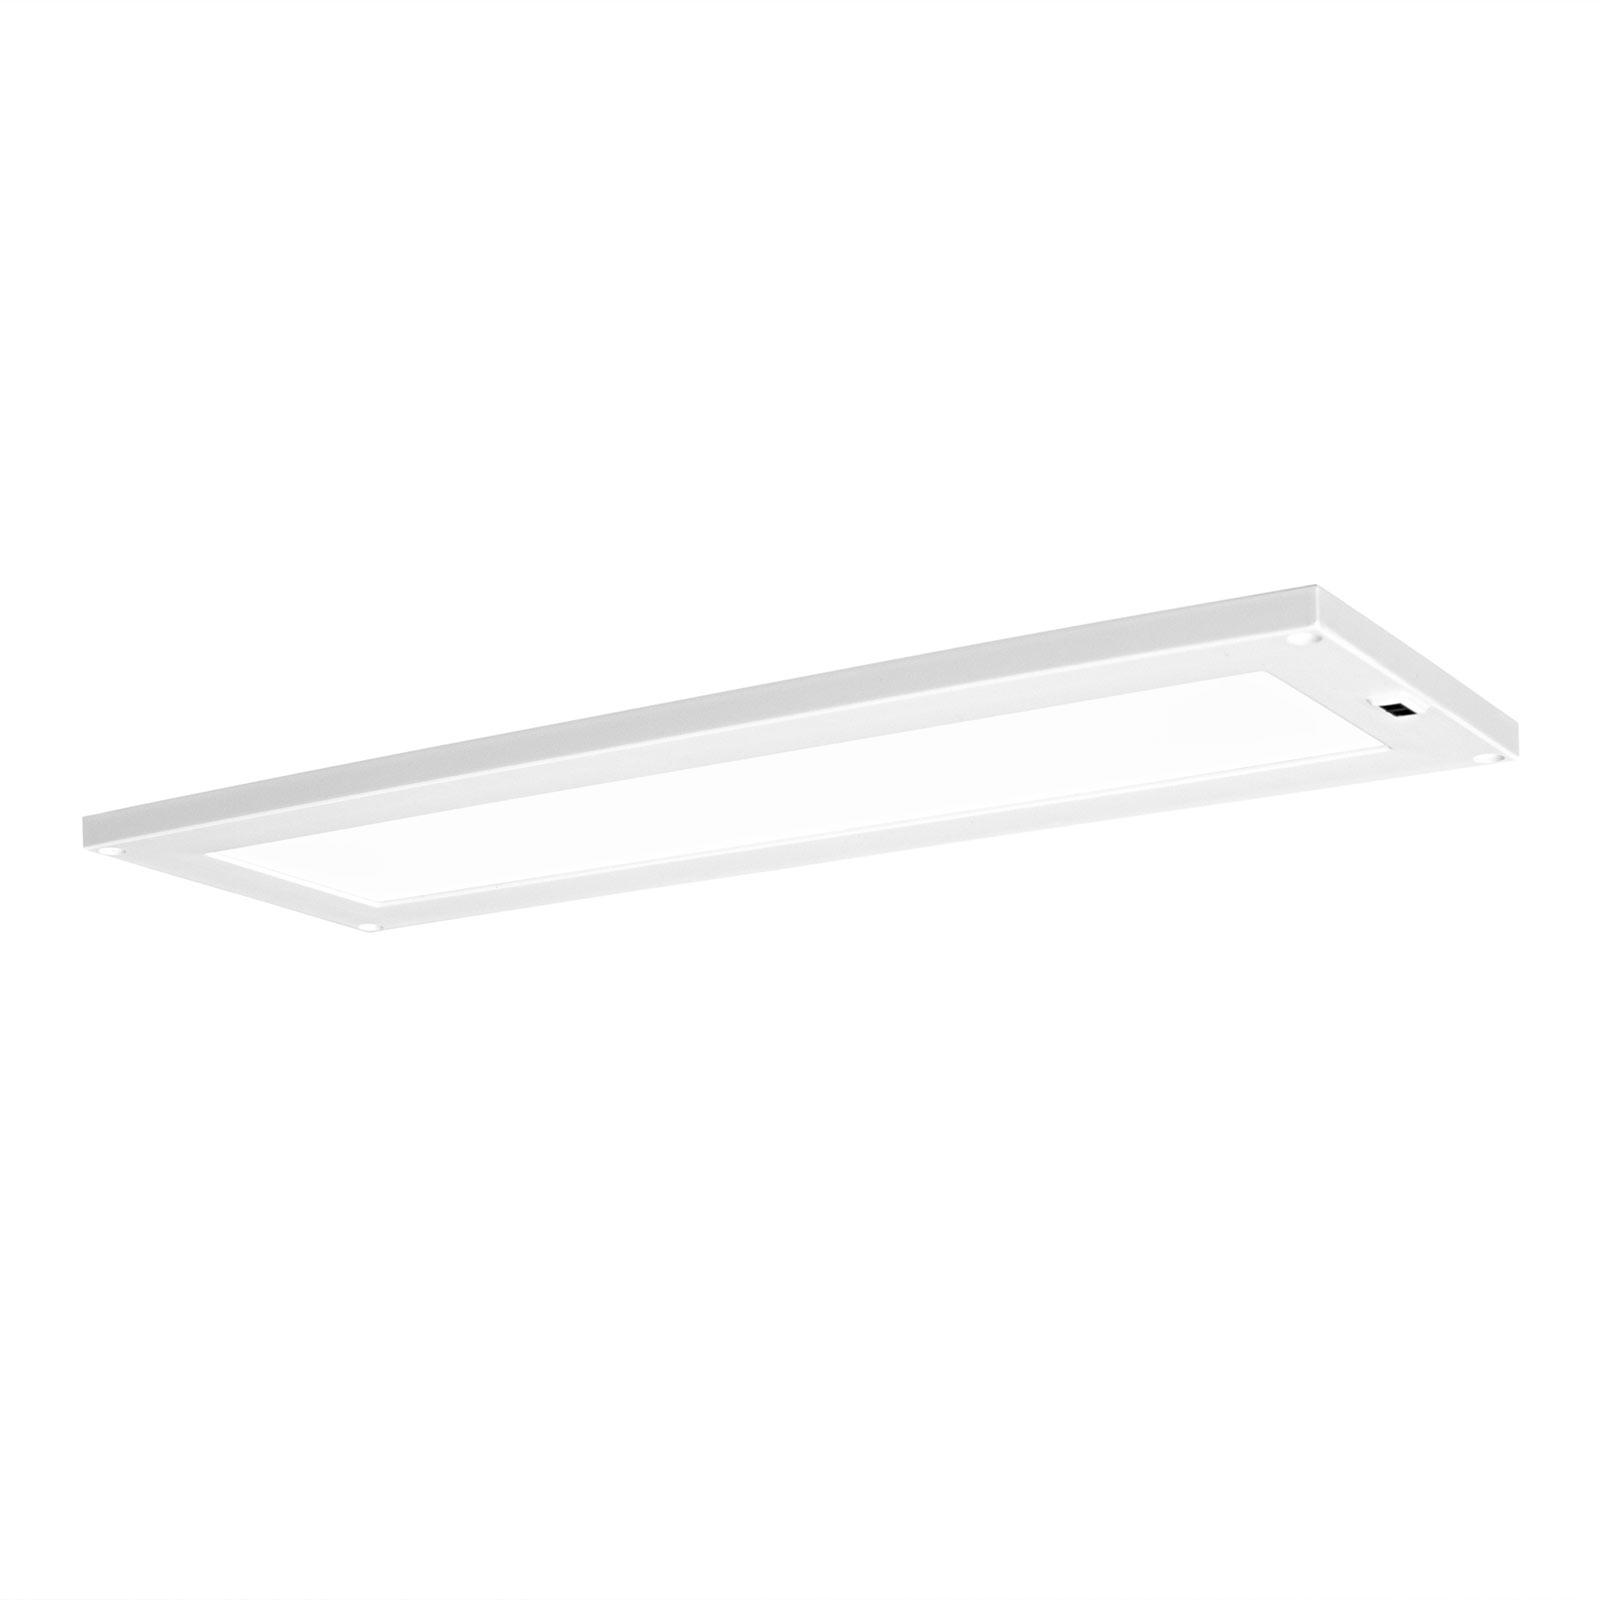 LEDVANCE Cabinet Panel -kaapinalusvalaisin 30x10cm